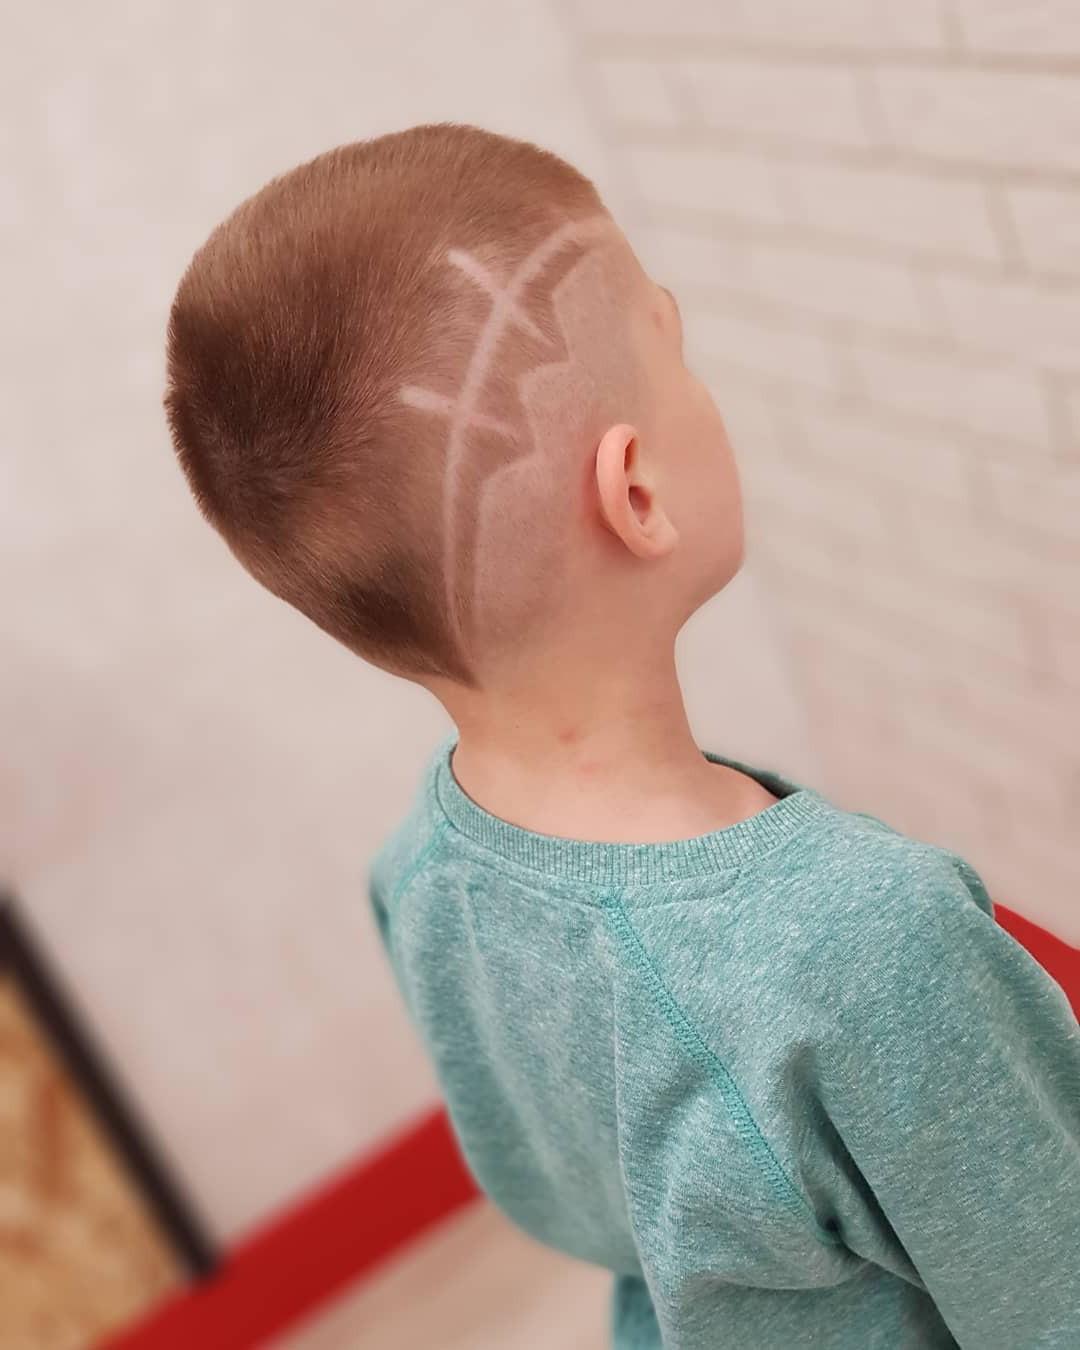 High Fade Undercut with Asymmetrical Lines for Boys